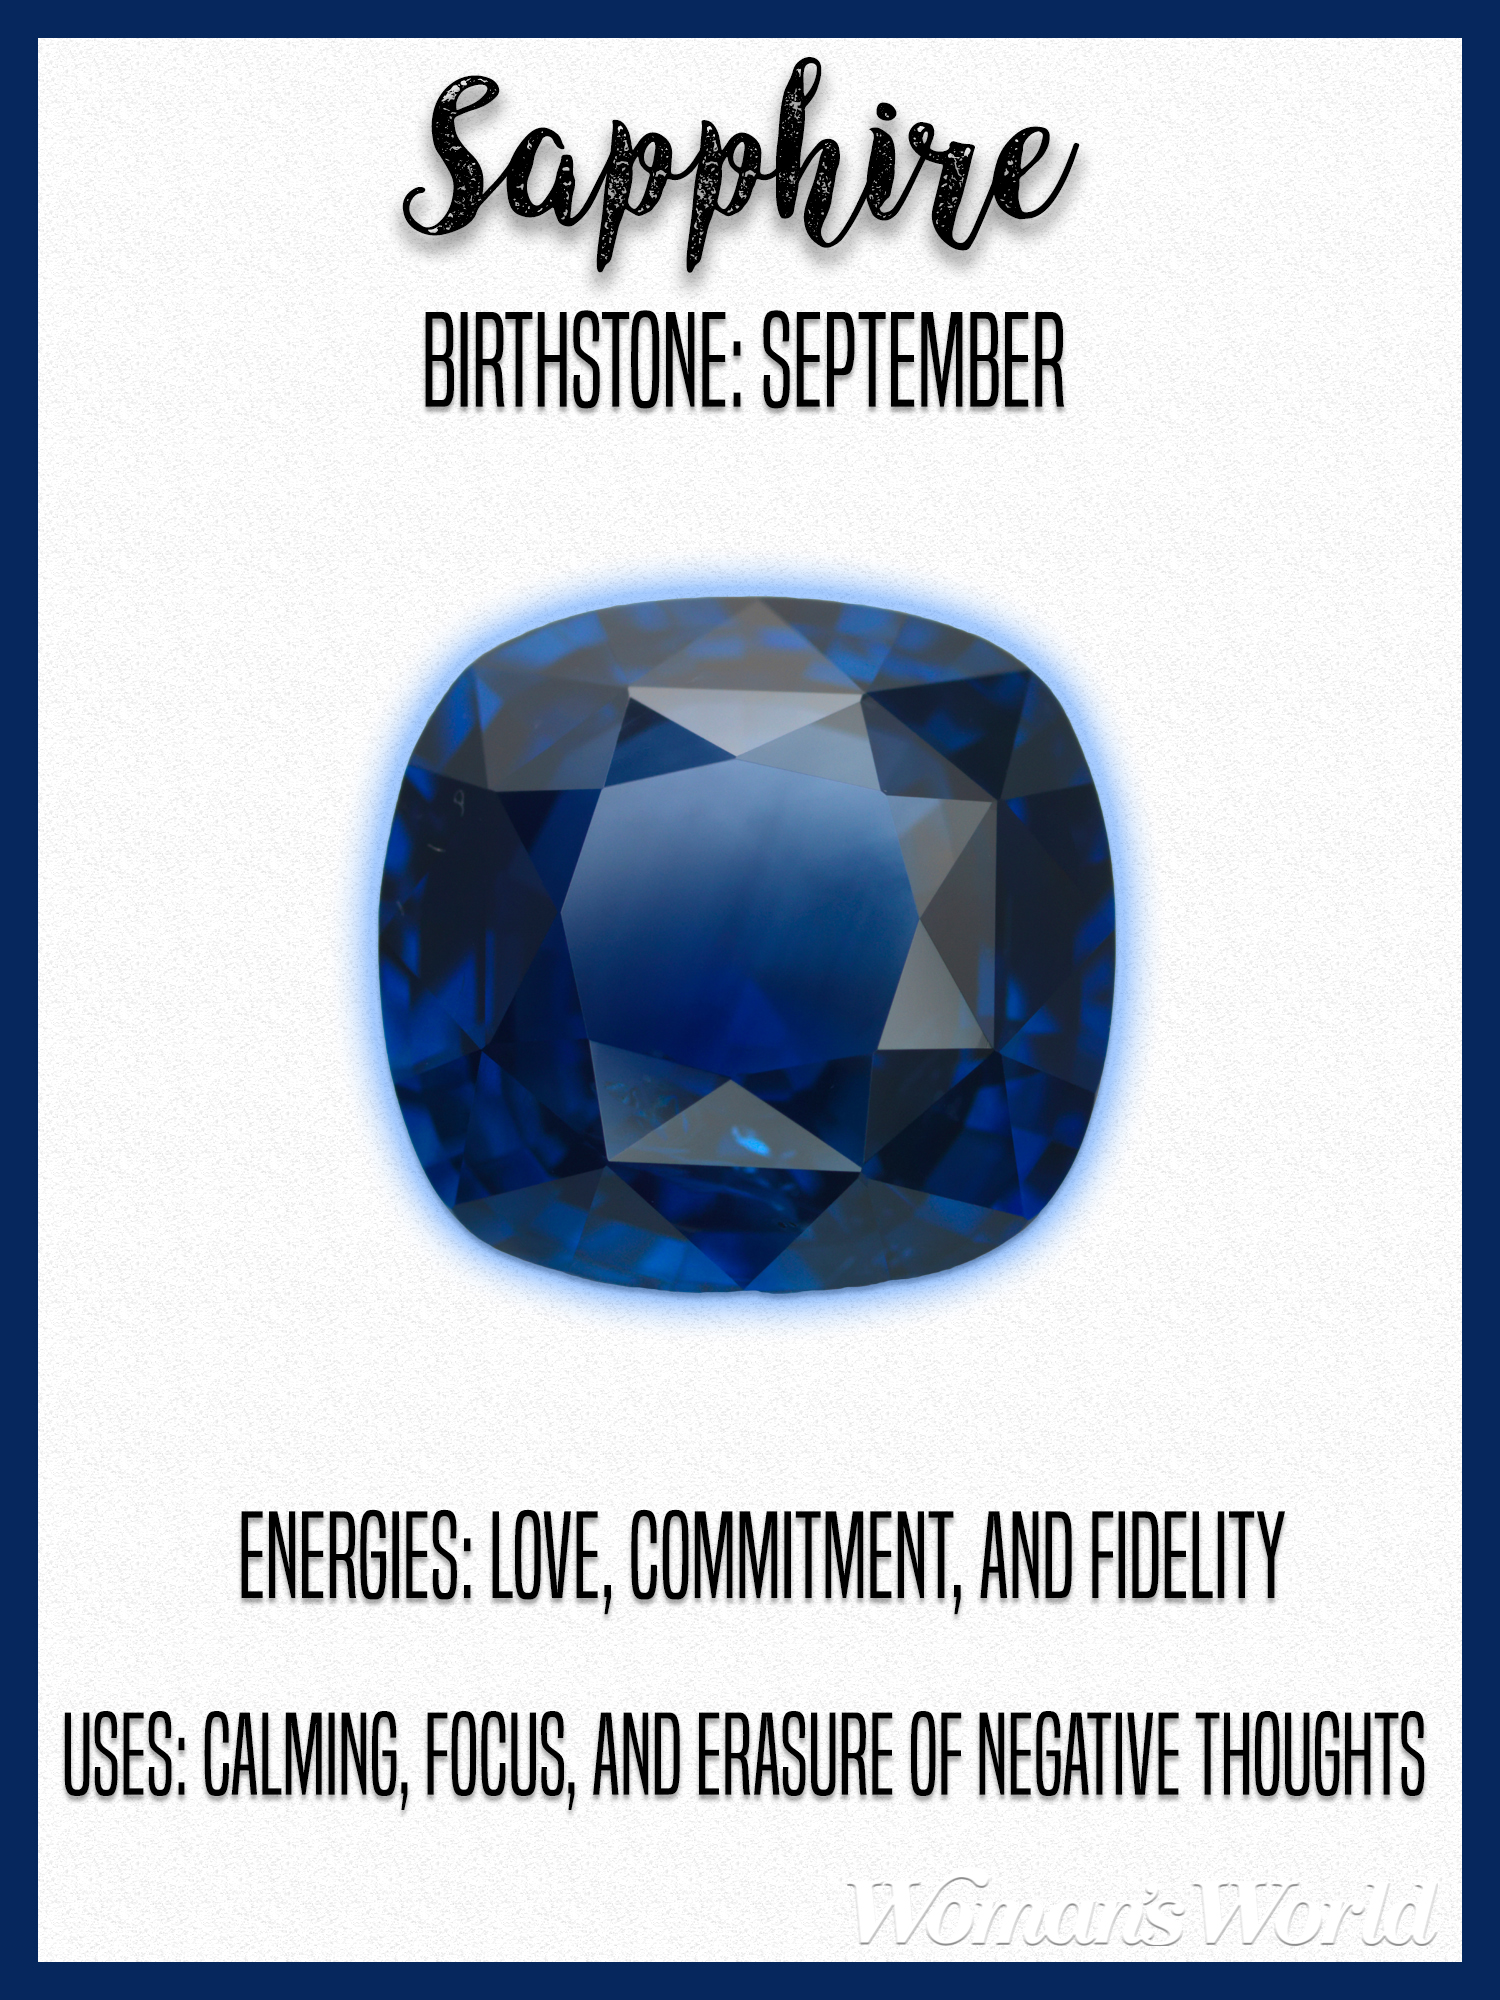 sapphire gemstone meaning